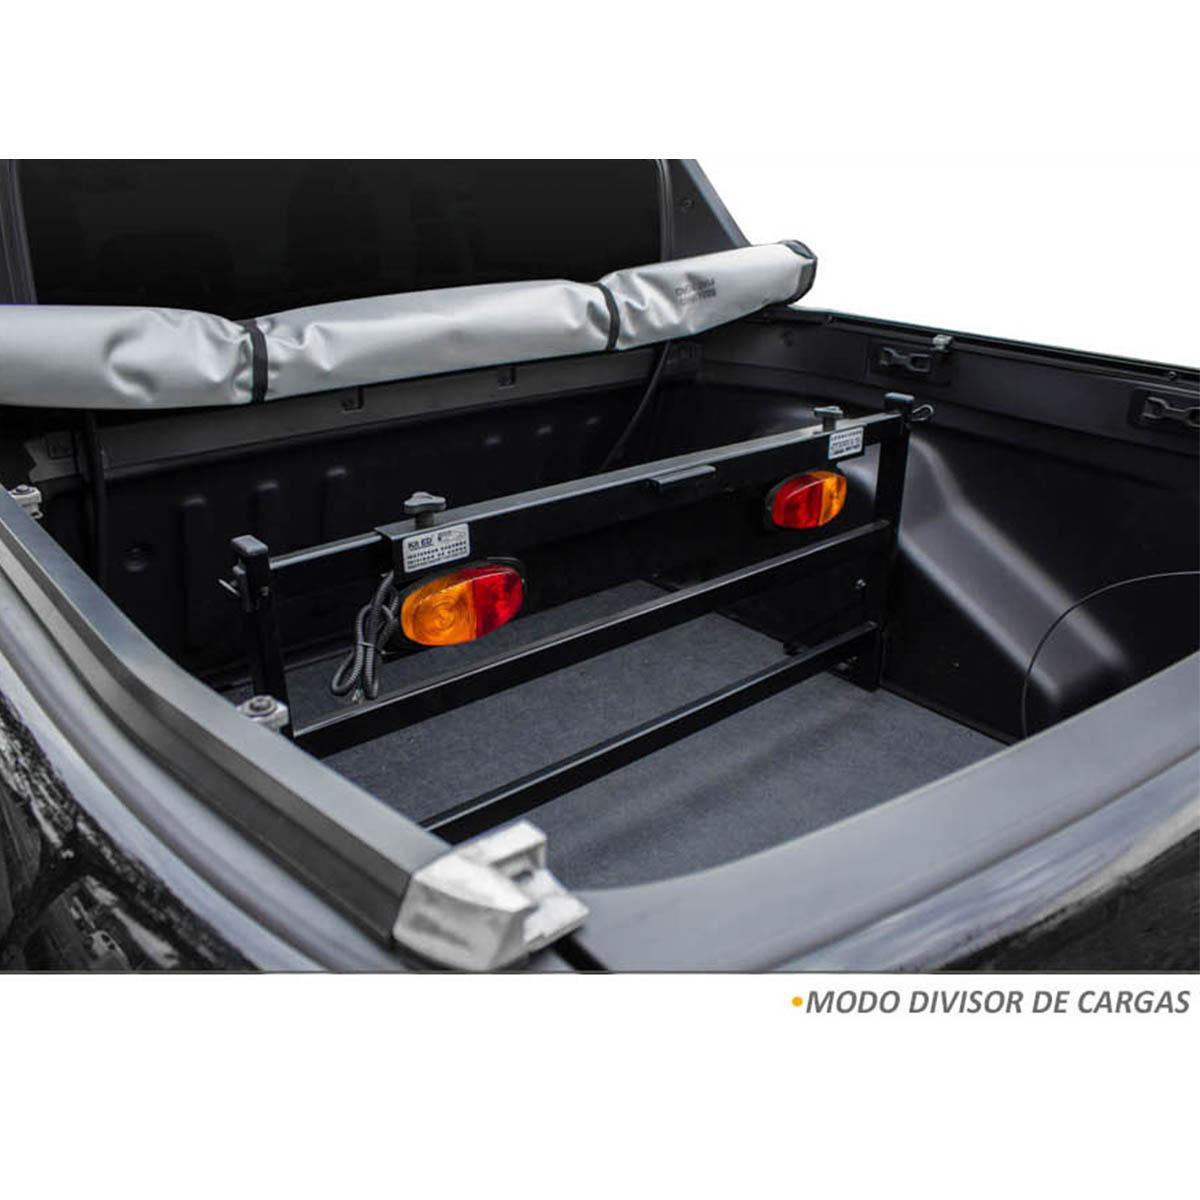 Extensor de caçamba preto Fiat Toro 2017 a 2021